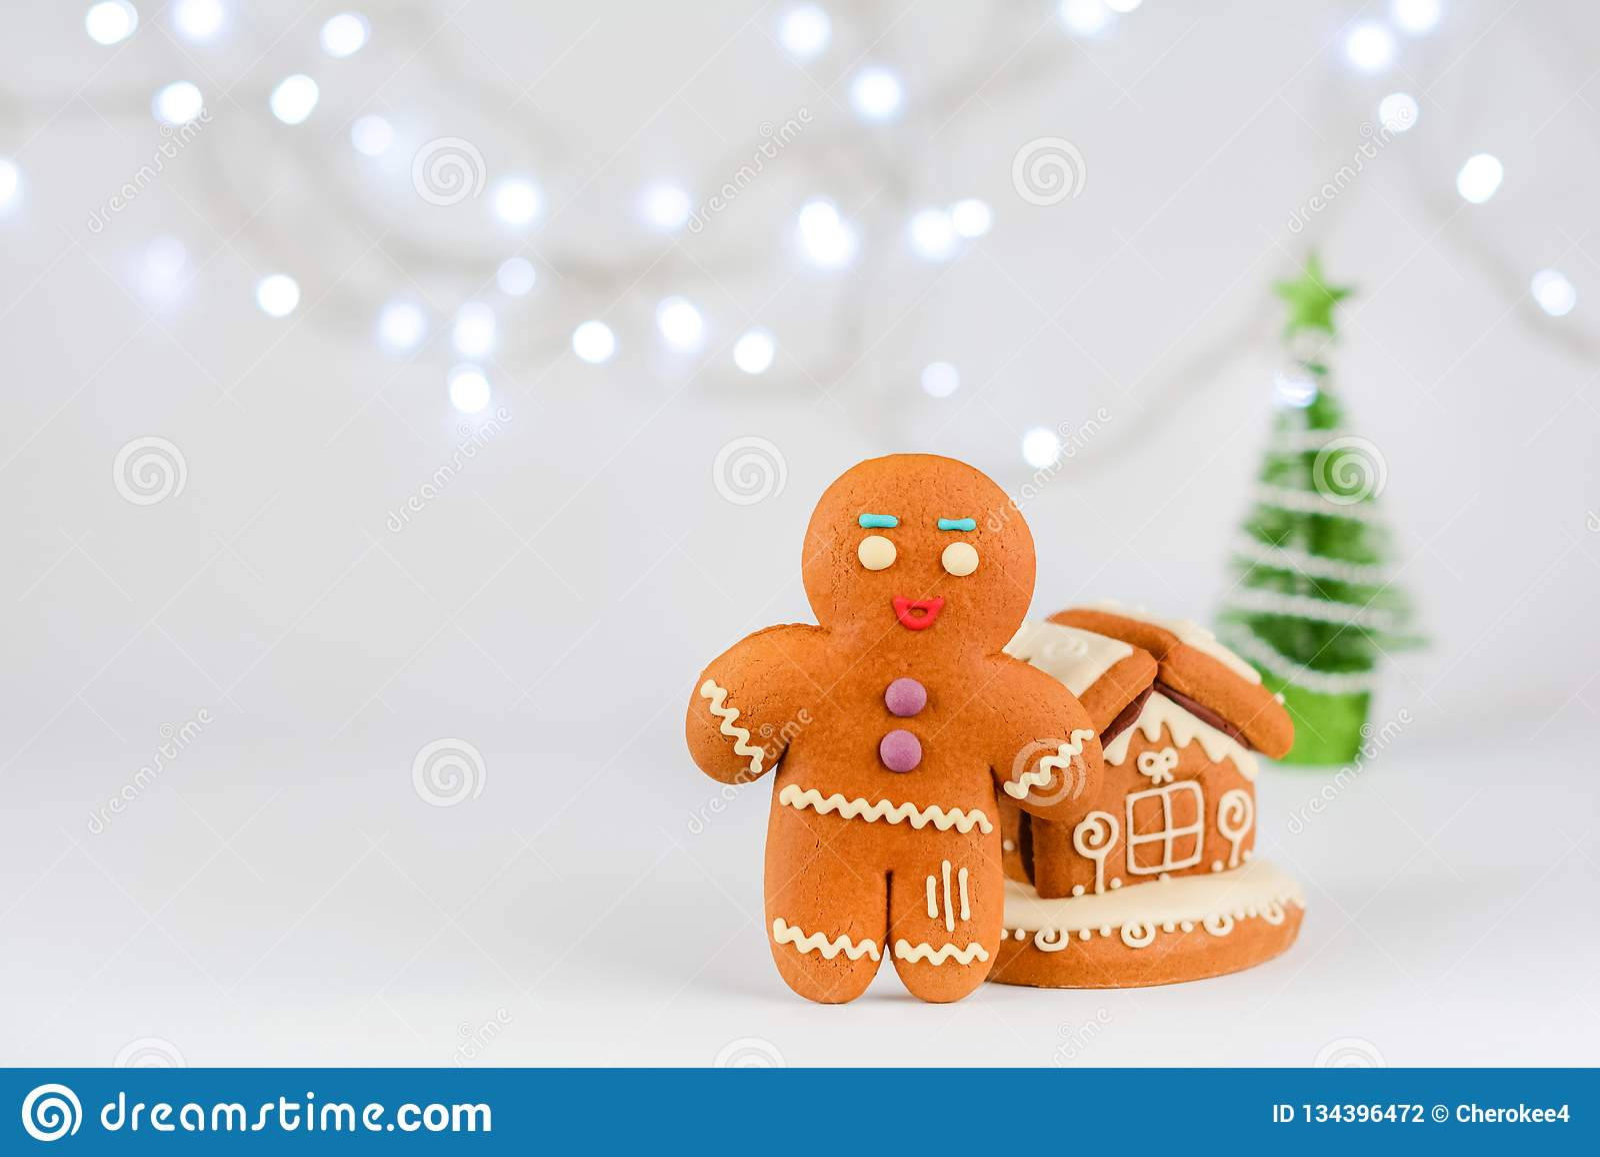 Gingerbread man near the house. Christmas food decoration.